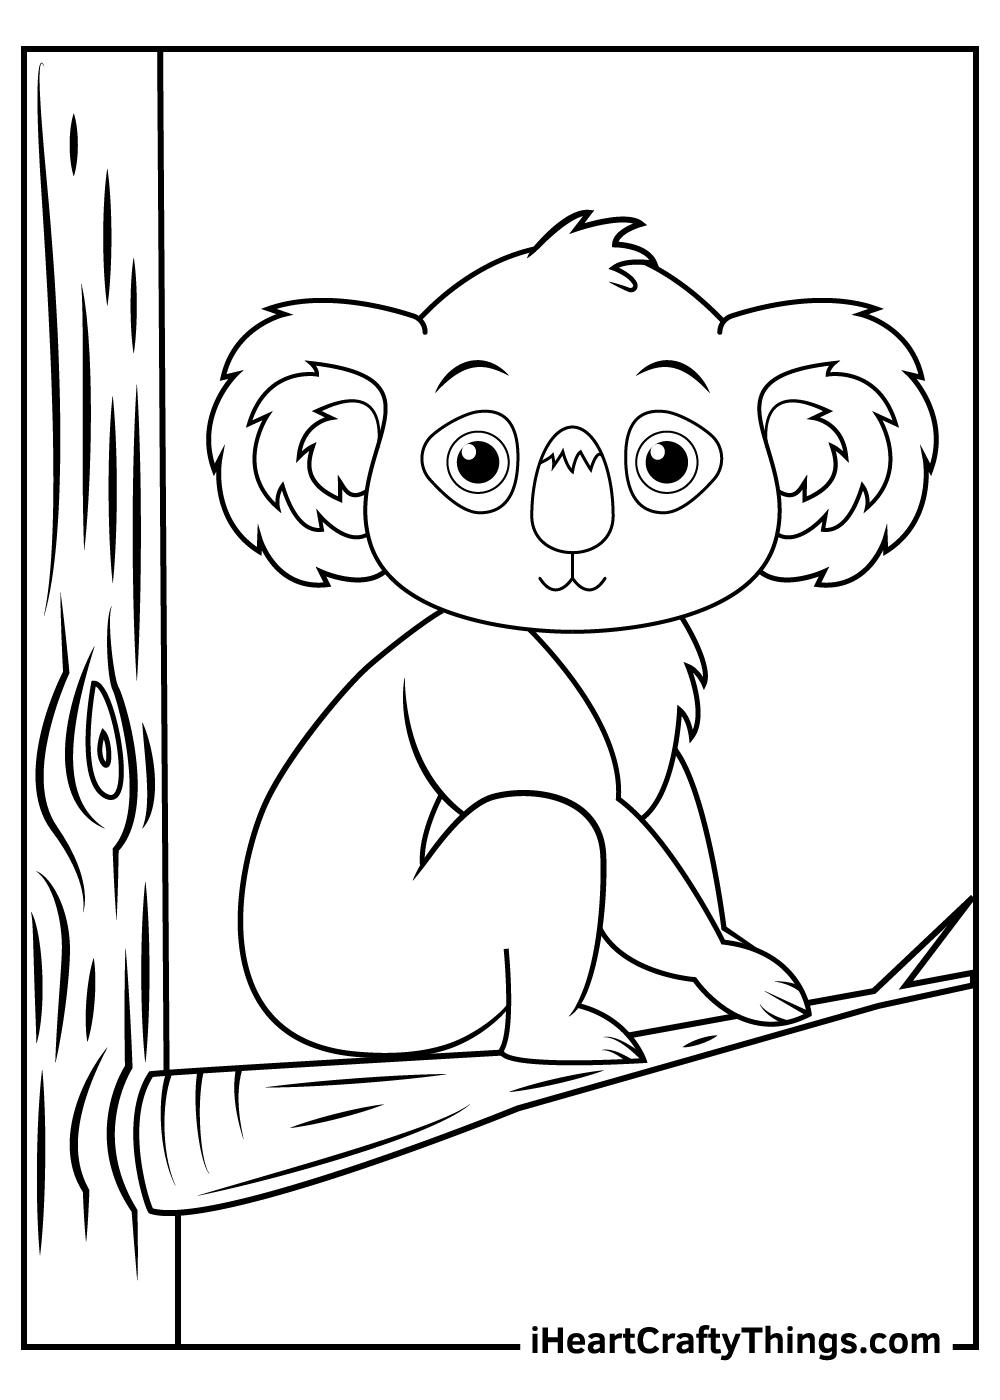 Koalas Coloring Pages free printable pdf